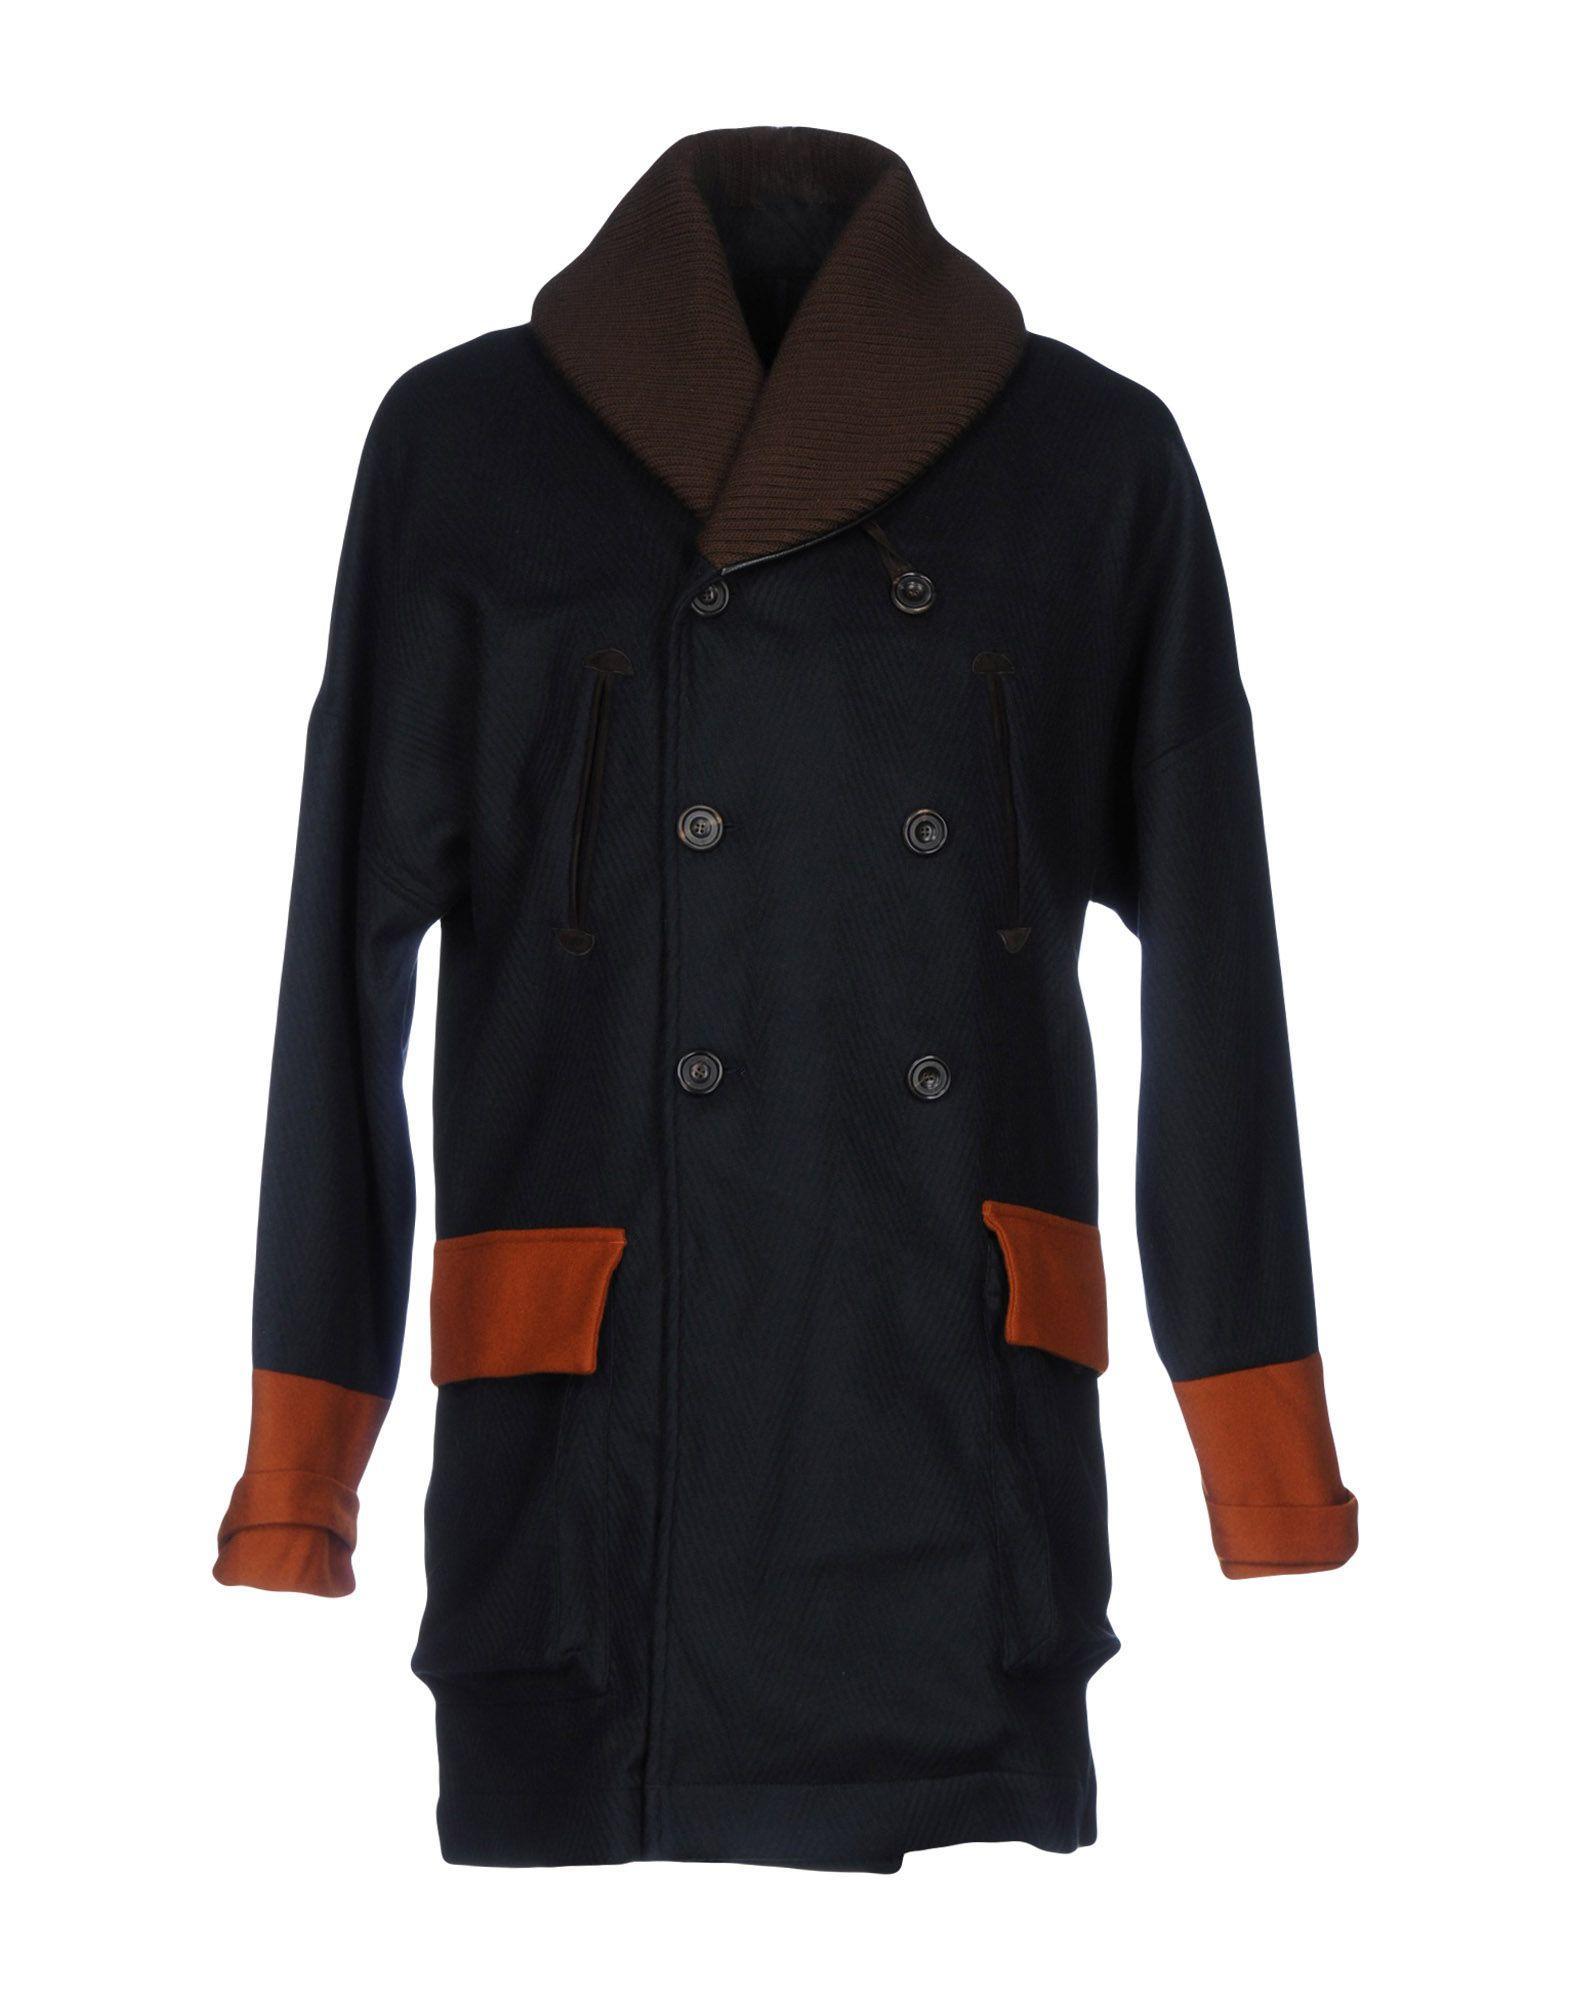 Commune De Paris 1871 Coats In Dark Blue